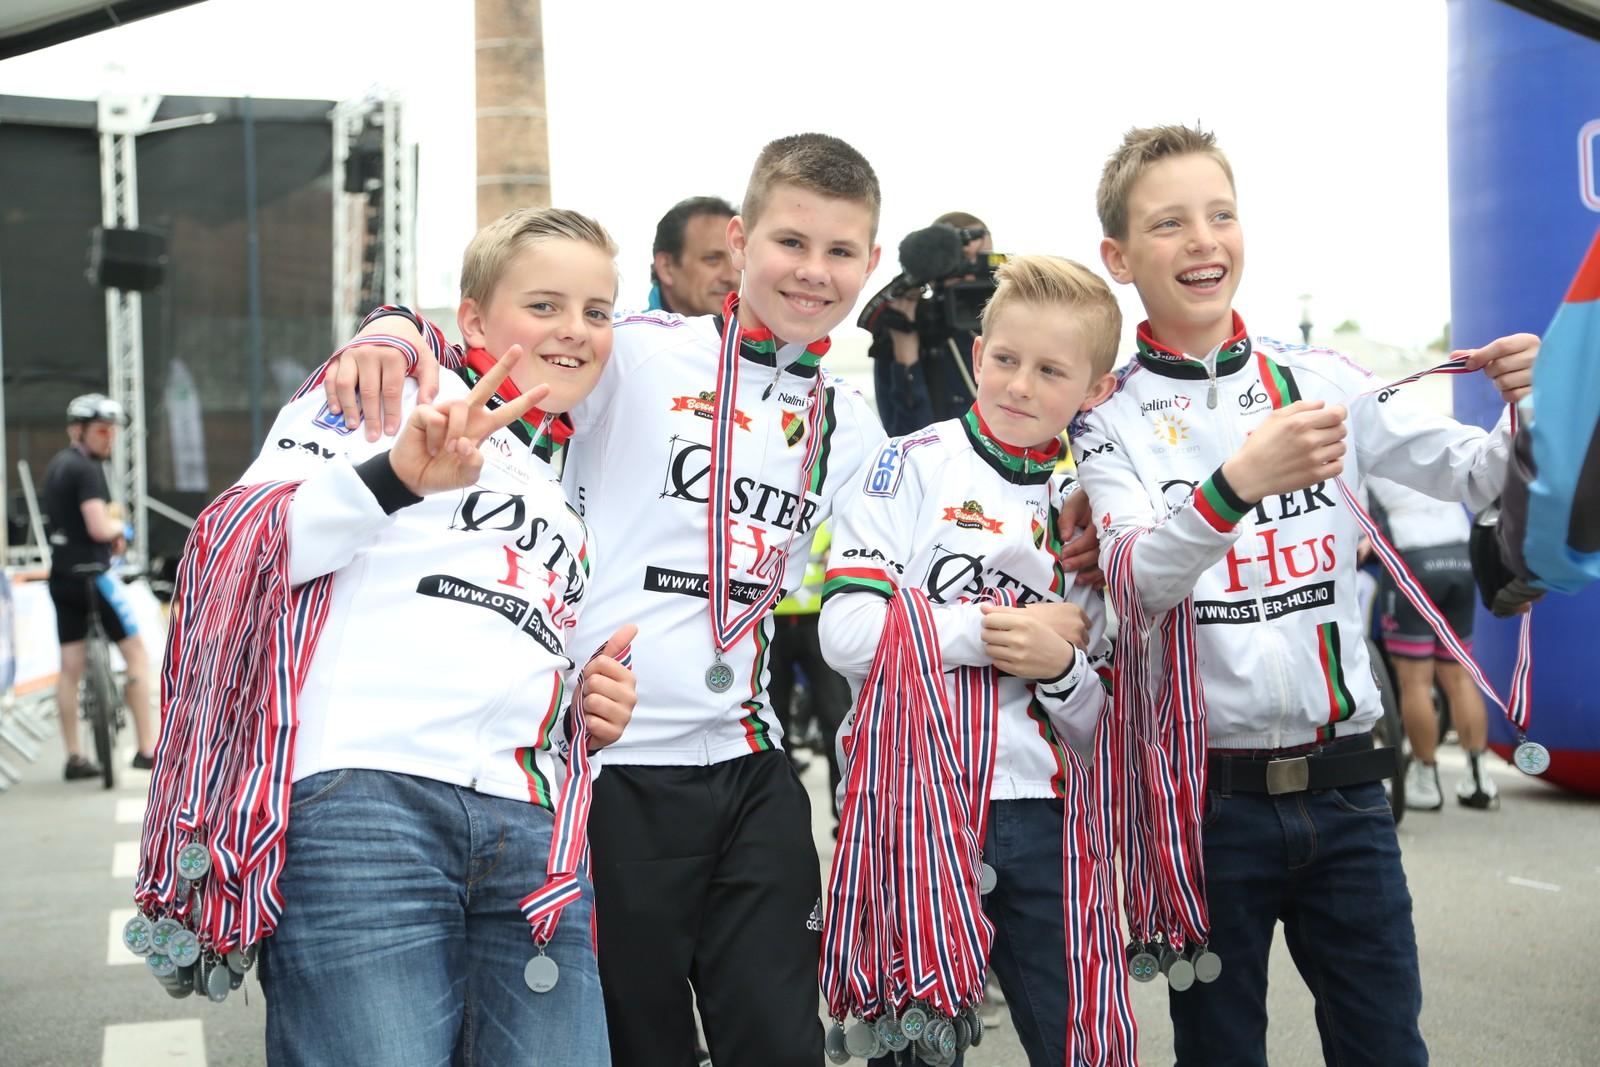 Flinke gutter står for medaljeutlevering ved målet i Sandnes.